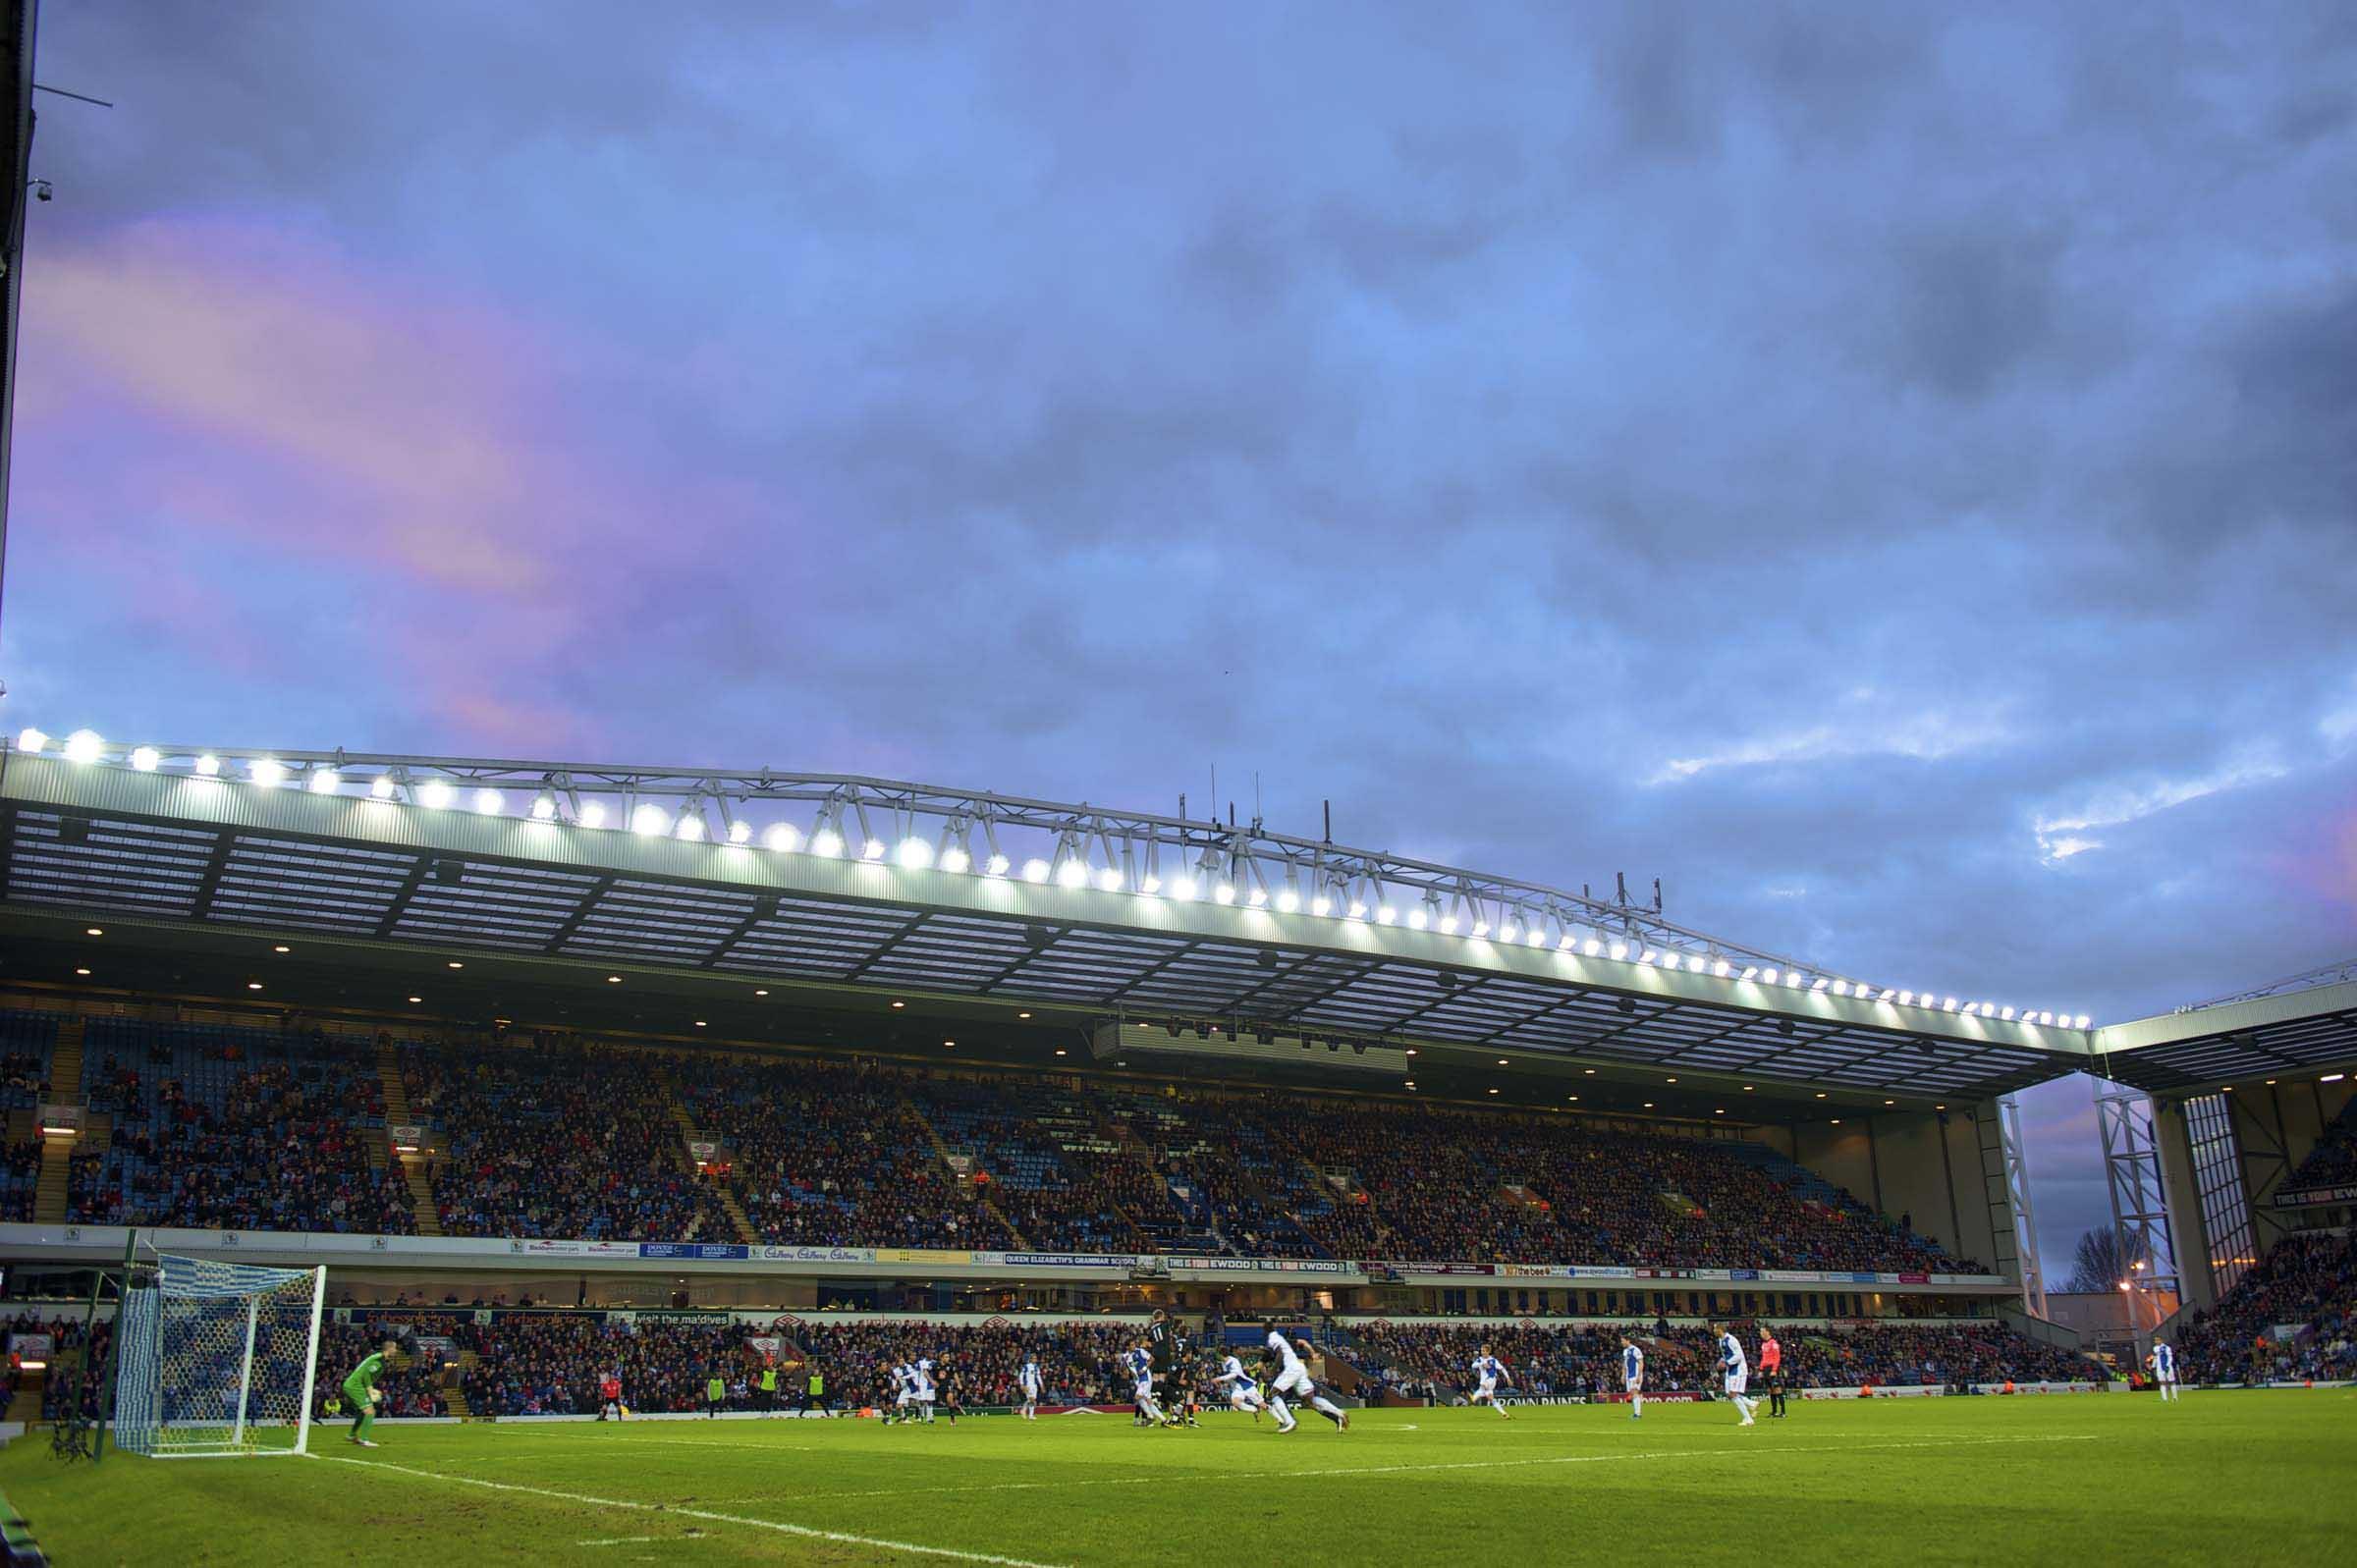 Football - FA Premier League - Blackburn Rovers FC v West Bromwich Albion FC